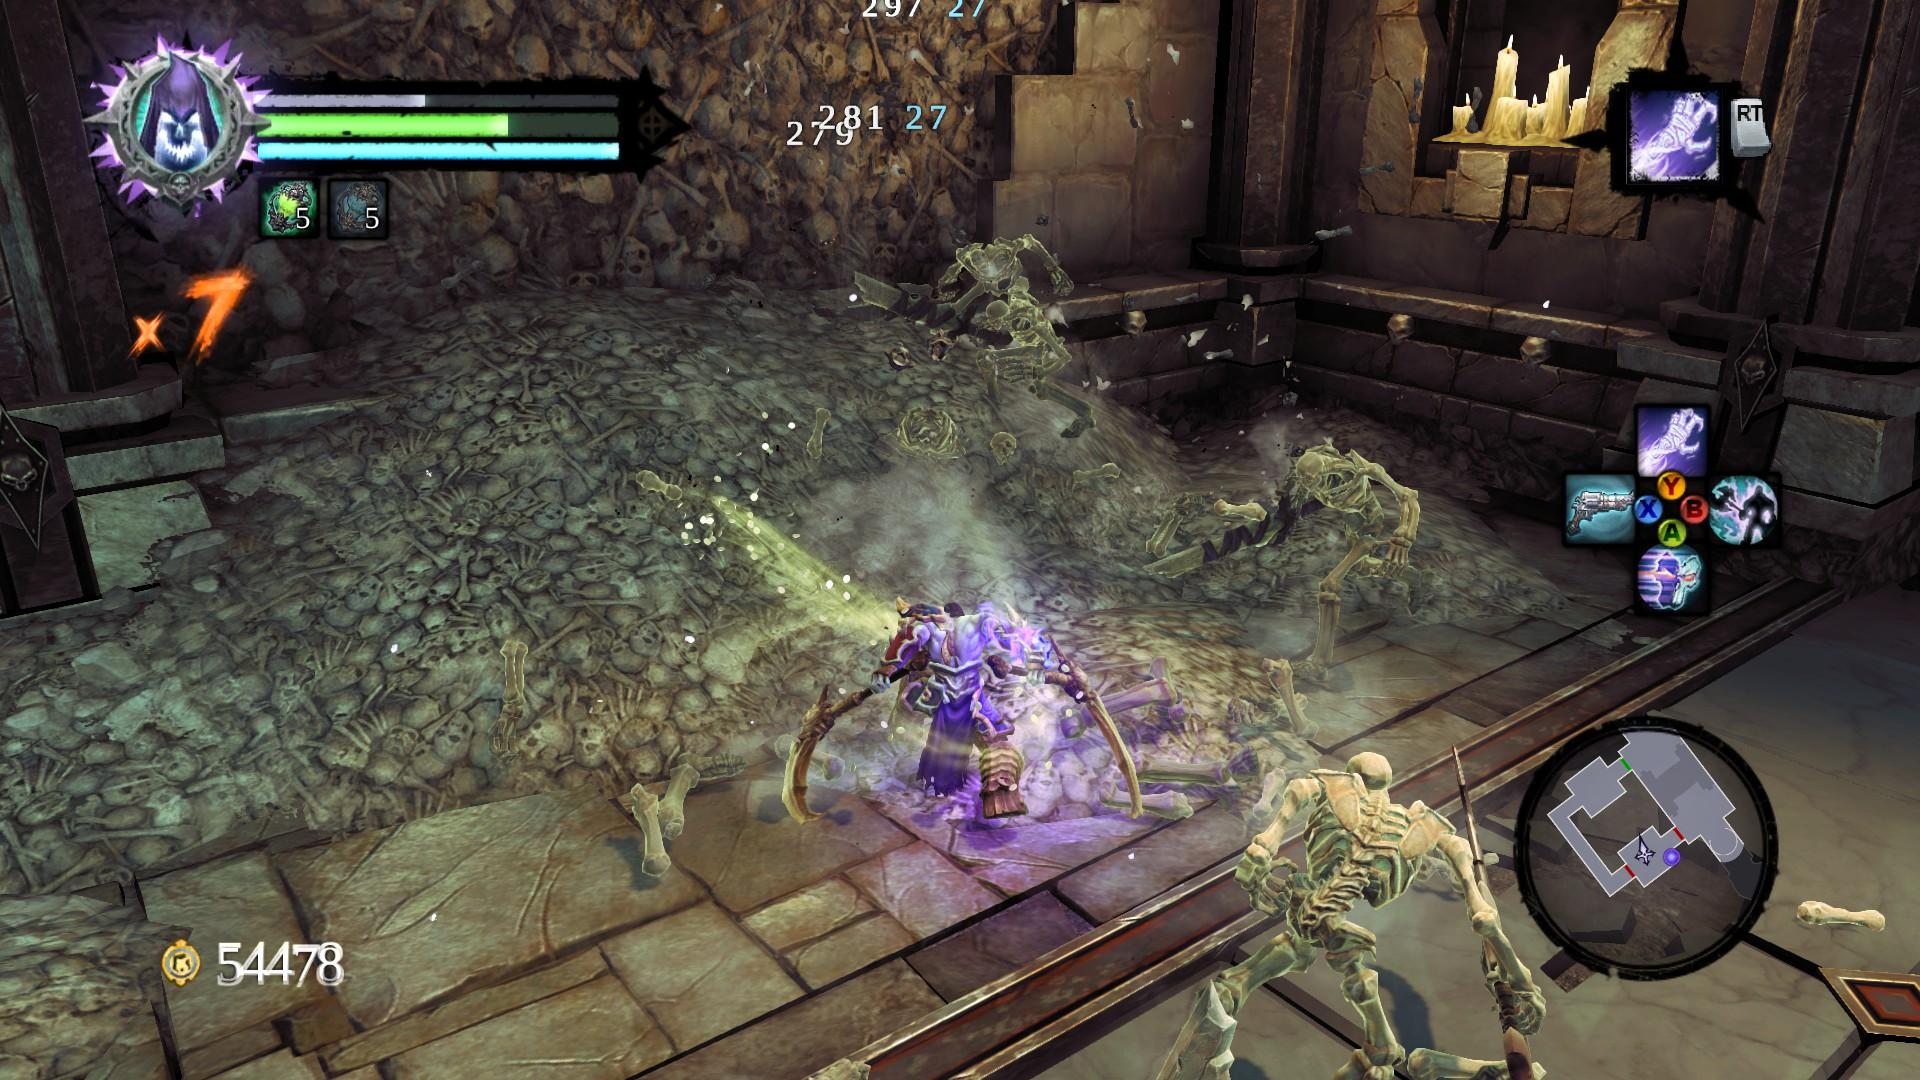 darksiders ii review nigmabox